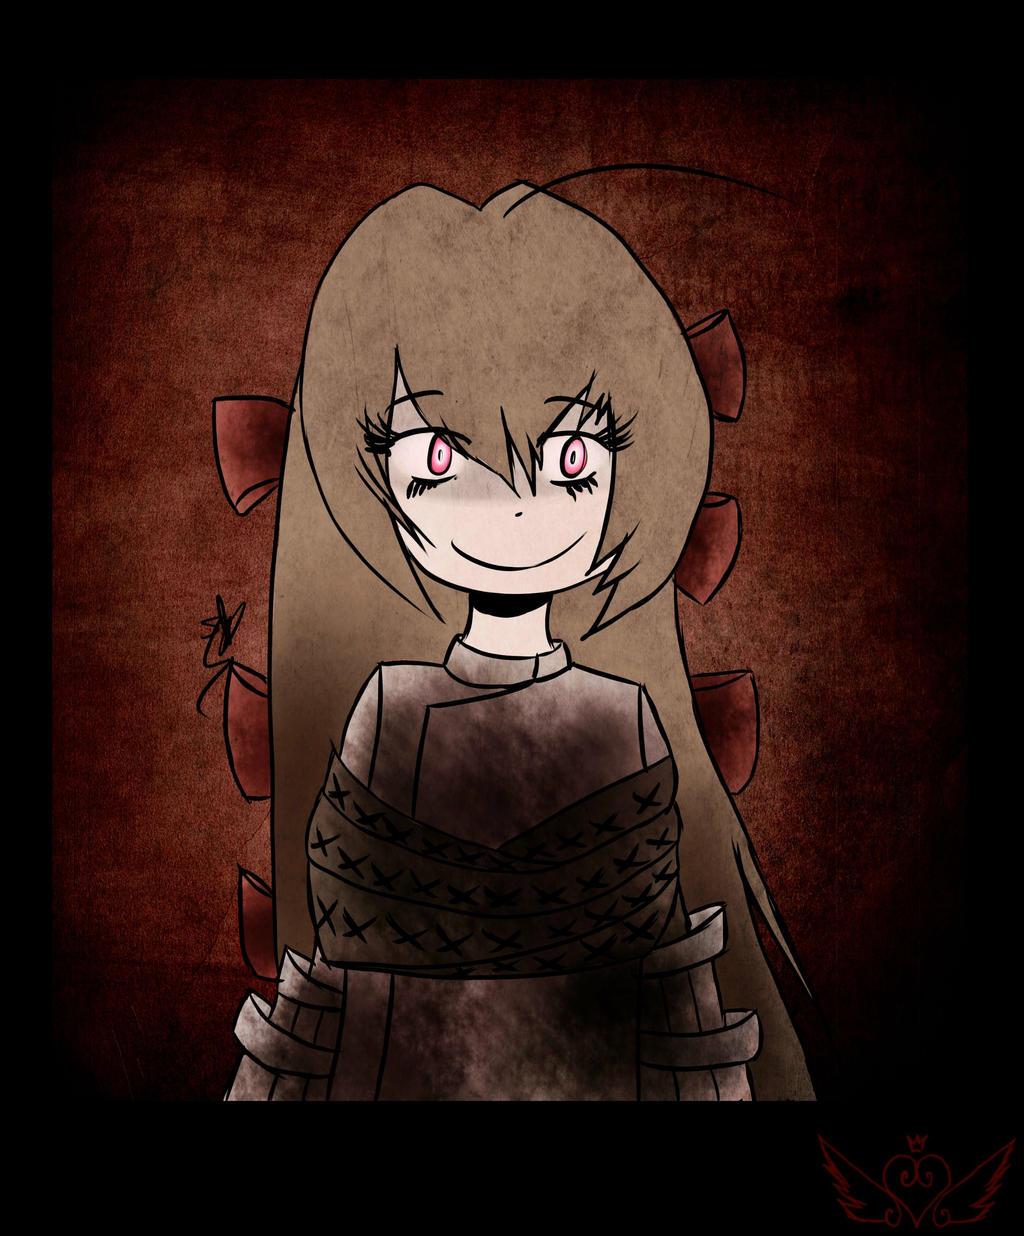 [FairytaleAsylum] Rapuzel [Portrait] by OpalesquePrincess